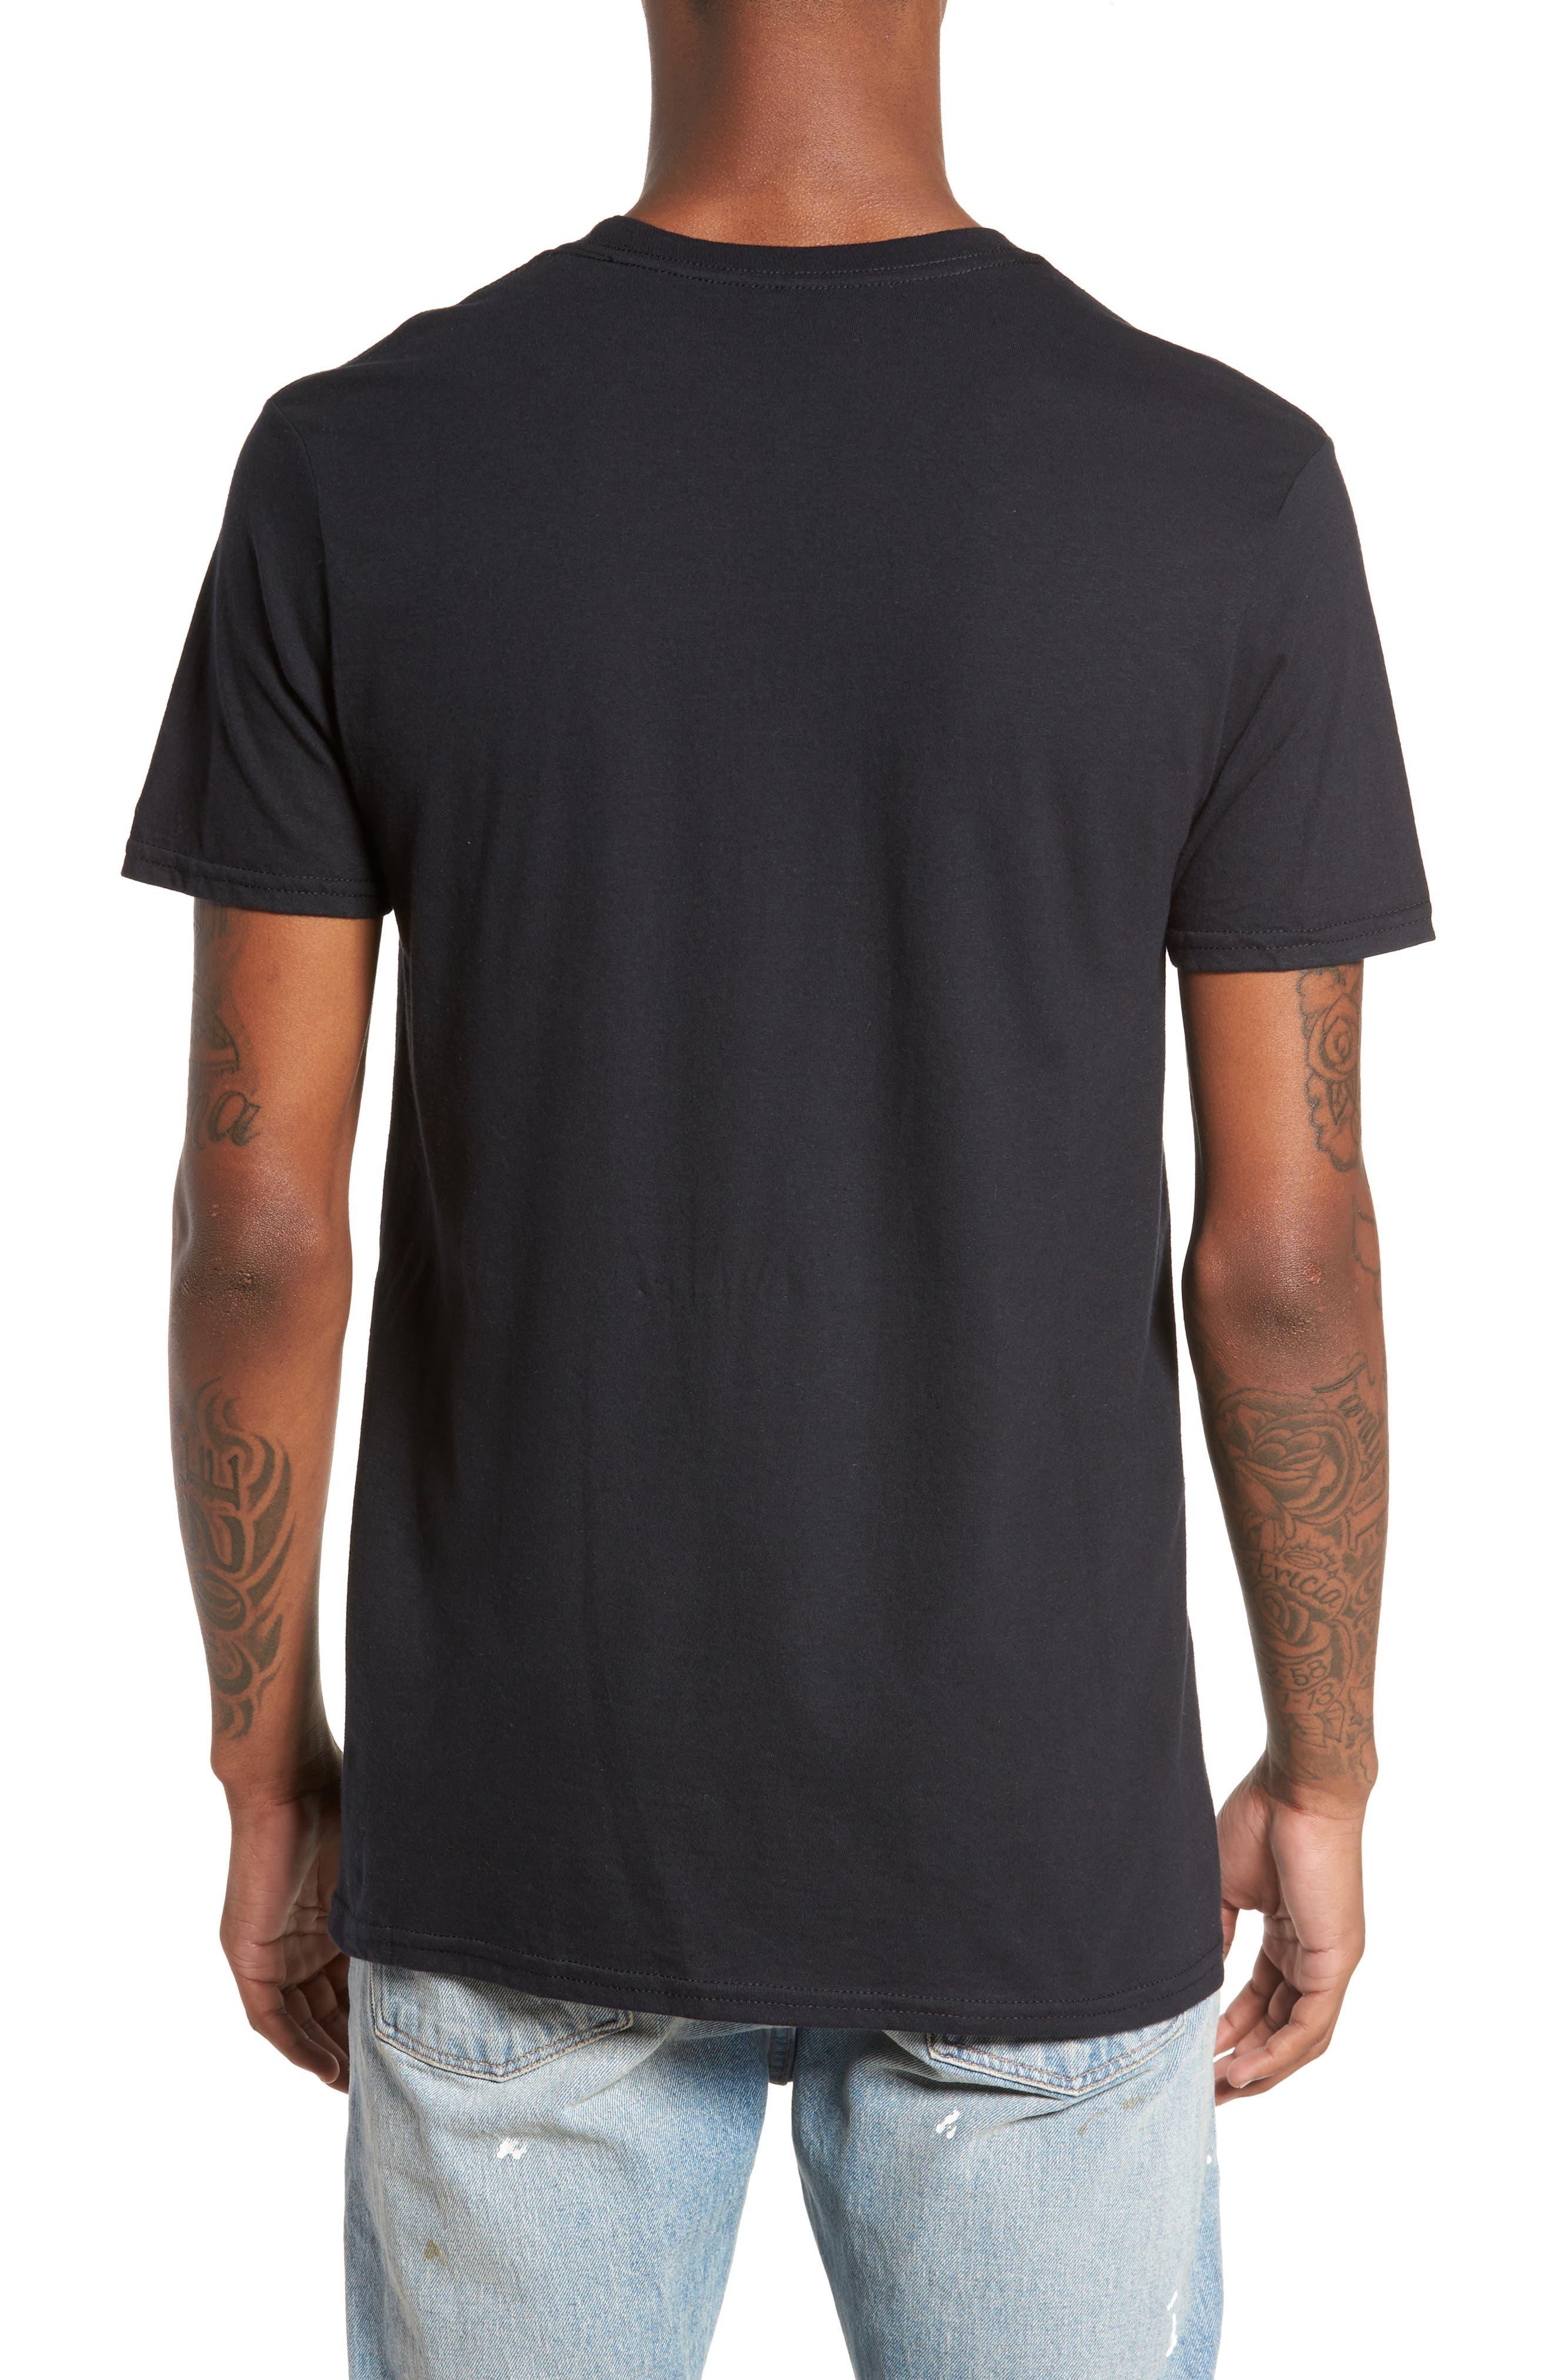 Digital Underground T-Shirt,                             Alternate thumbnail 2, color,                             Black Digital Underground